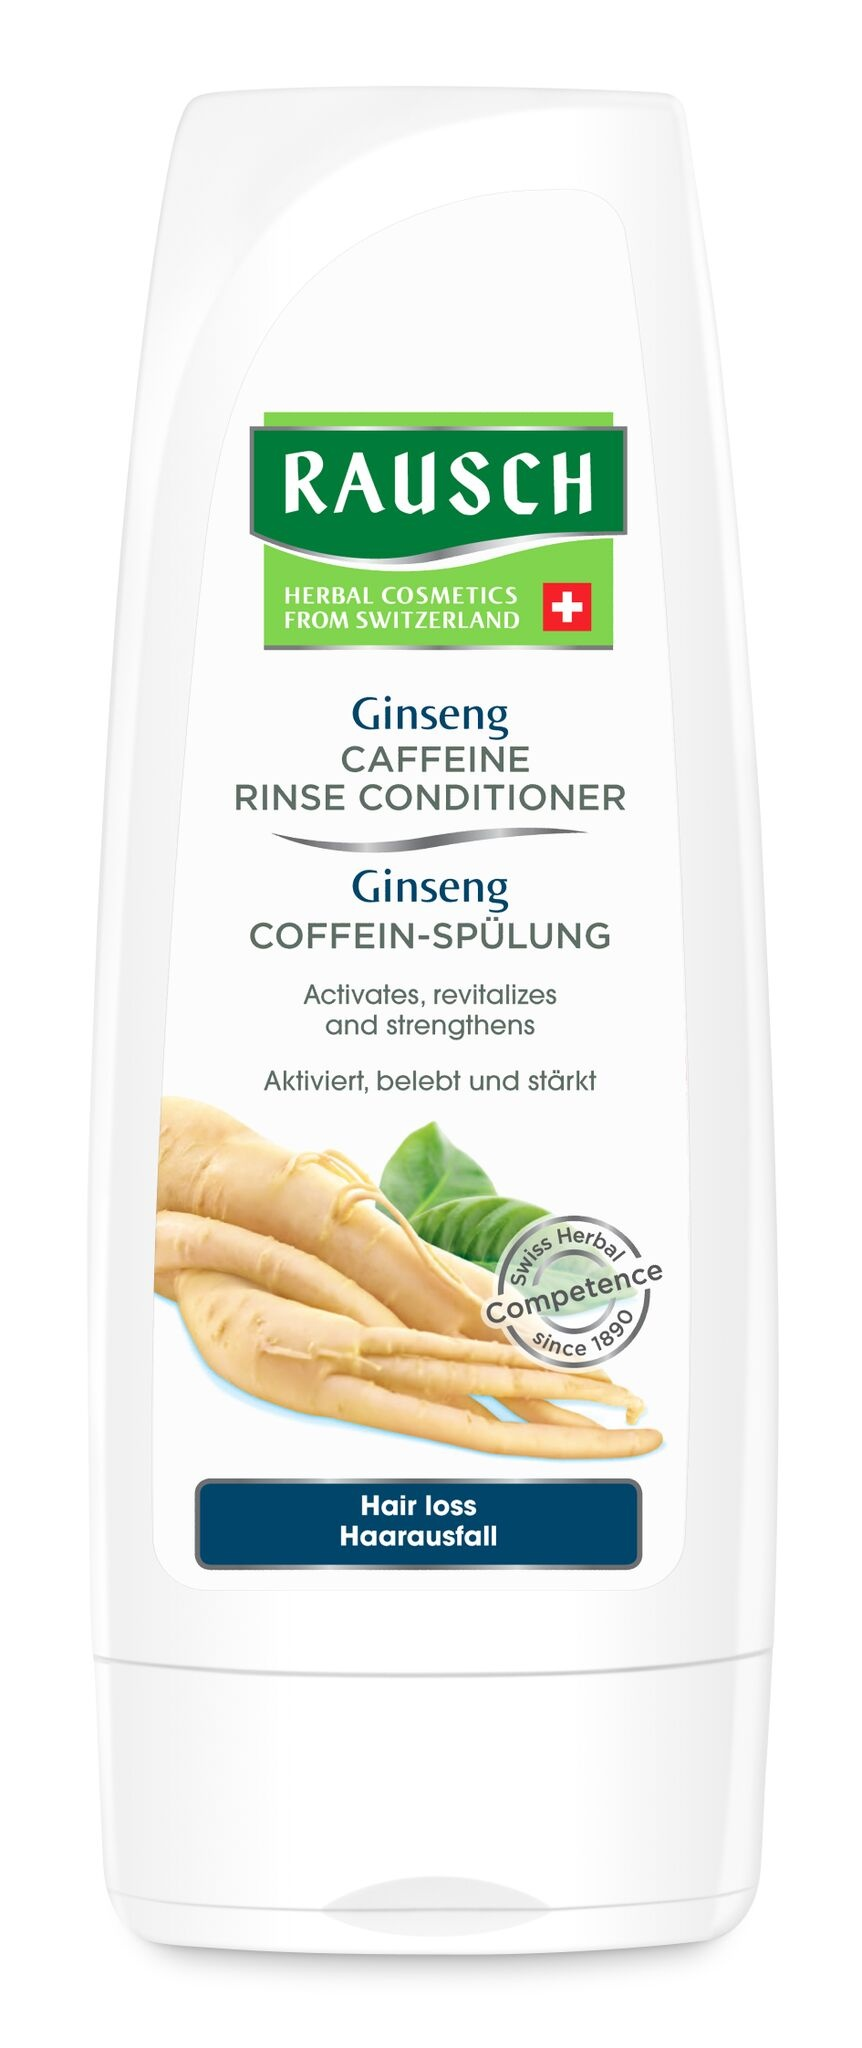 Rausch Ginseng Caffeine Rinse Conditioner for hair loss 200mL